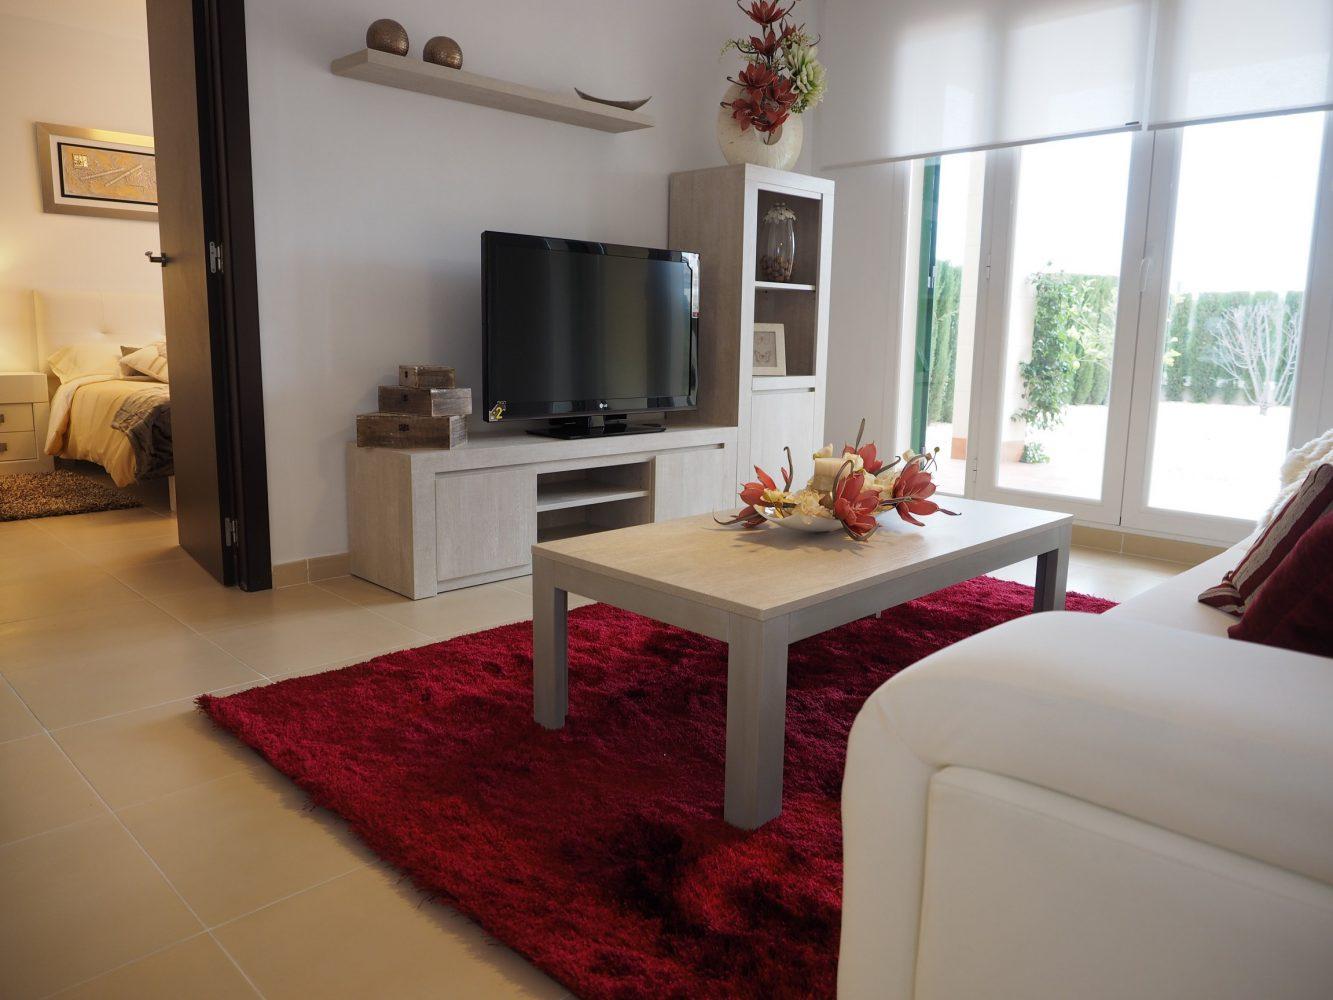 Mobles es Fabricant, muebles color crema